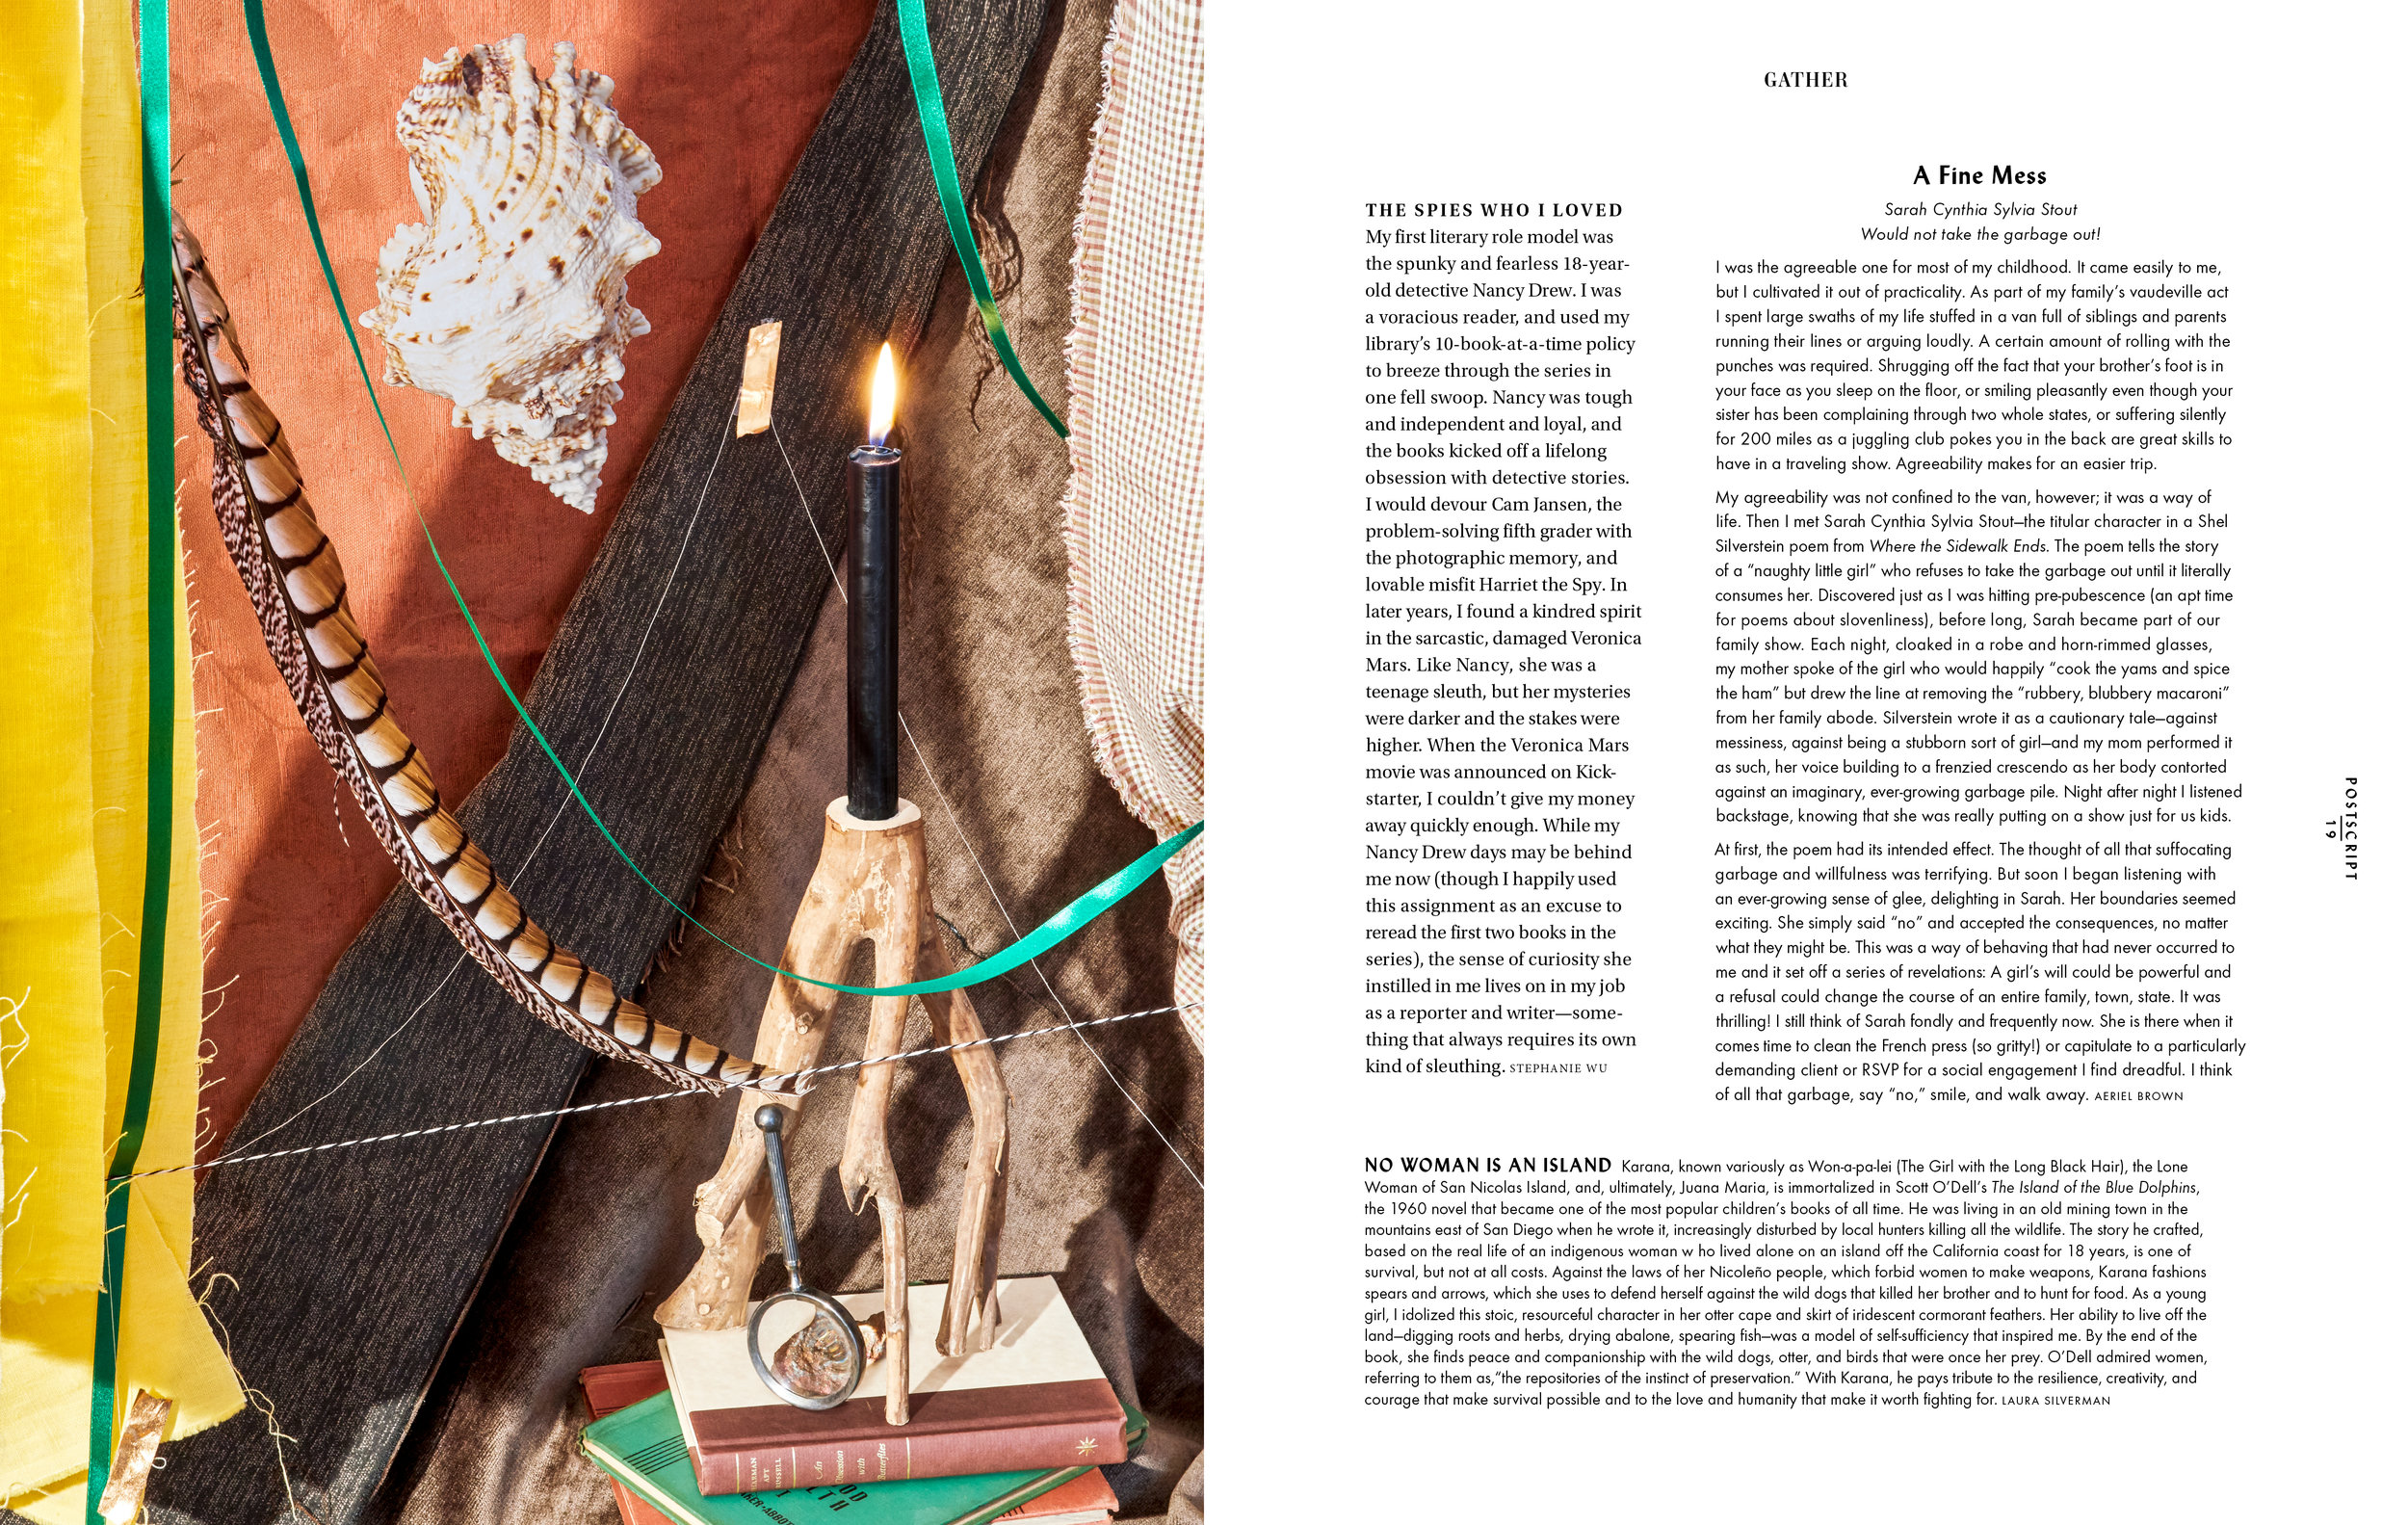 GatherJournal_S17_Heroines_Issue_layout_10.jpg